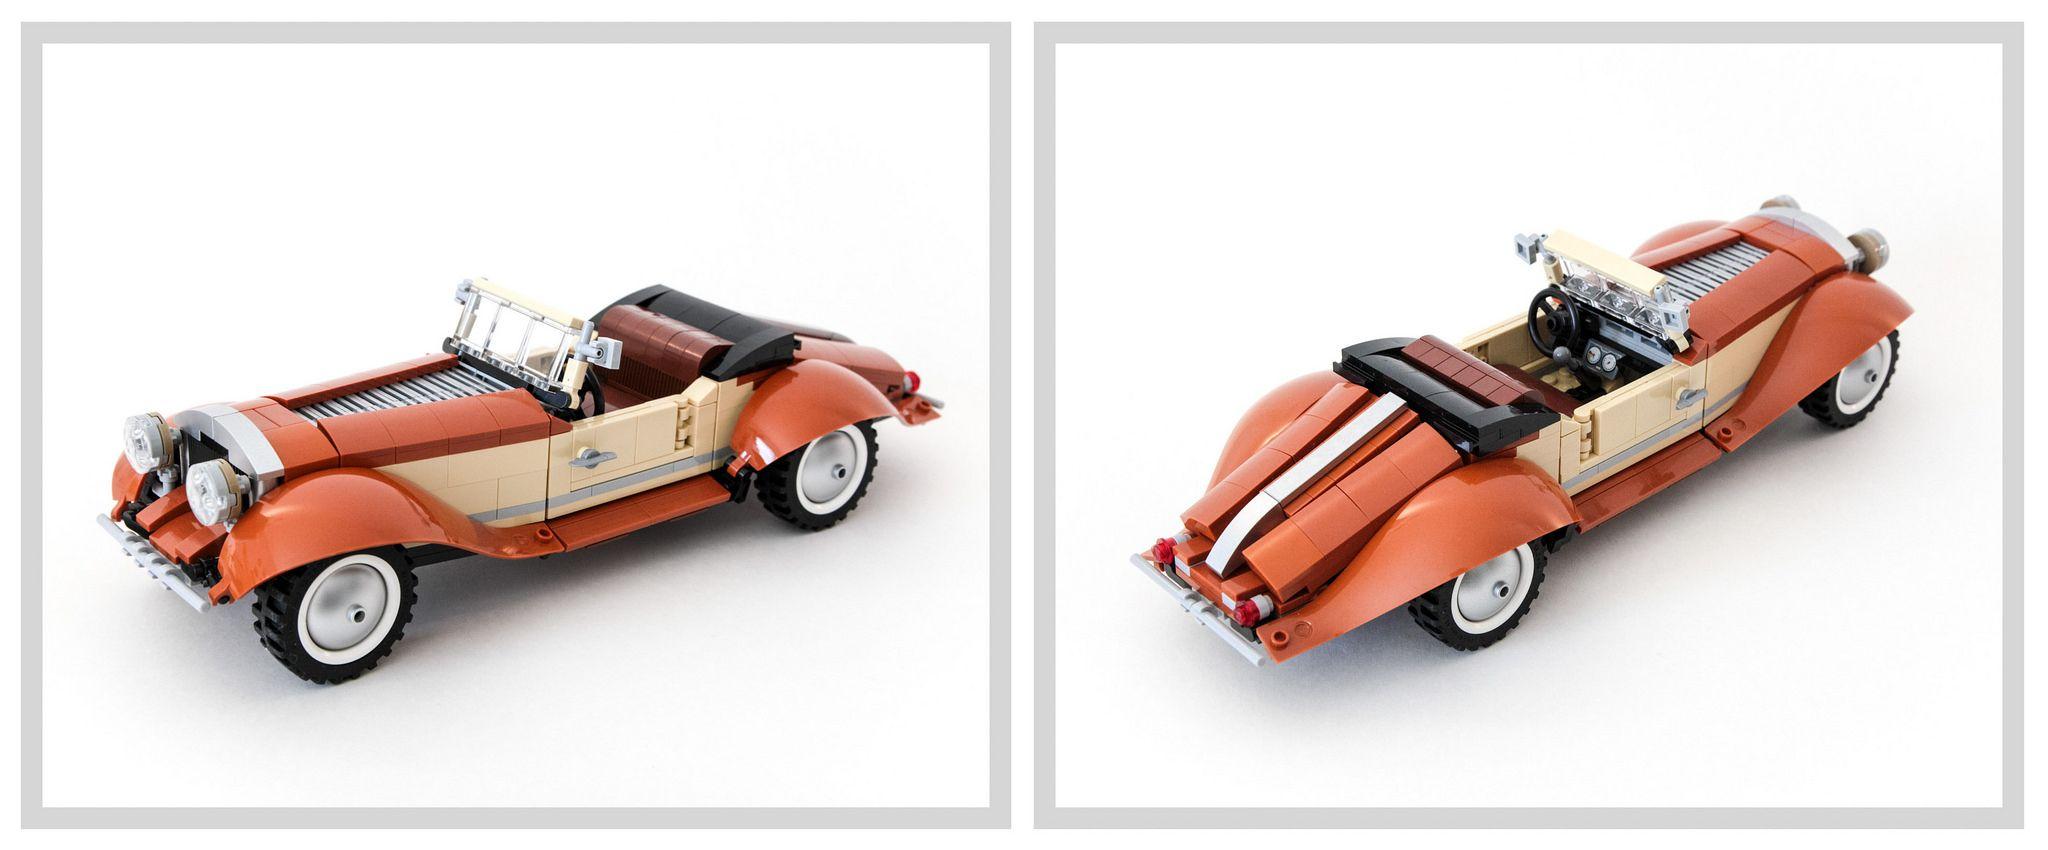 Vintage Roadster Cream tea, Caterham seven, Lego